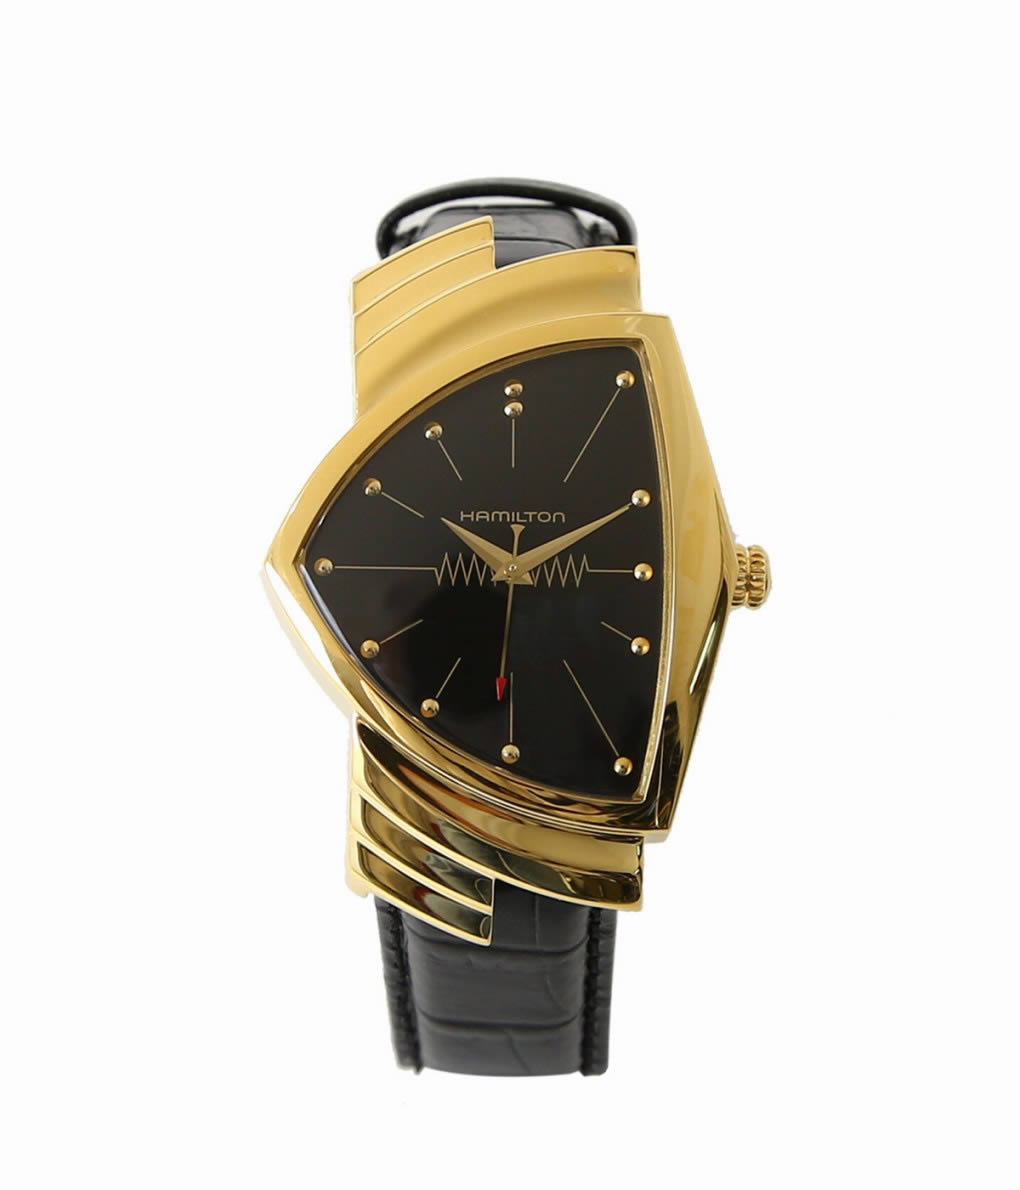 HAMILTON / ハミルトン : ベンチュラ : ハミルトン 腕時計 時計 ベンチュラ Ventura Quartz メンズ : H24301731 【MUS】